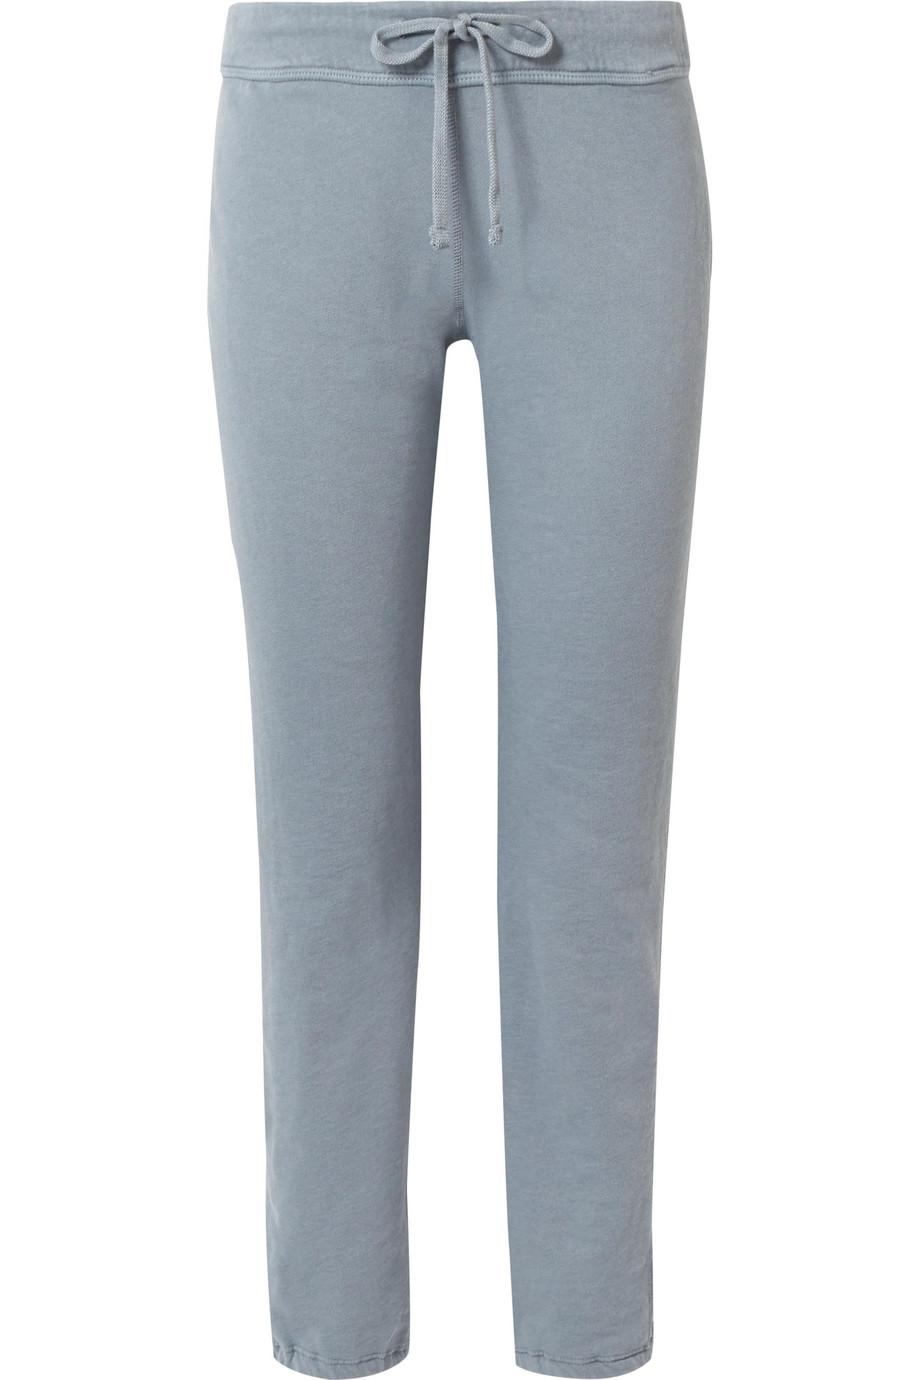 2018 For Sale Genie Supima Cotton-terry Track Pants - Black James Perse Buy Online Cheap Sale Outlet gZSEZIVAn